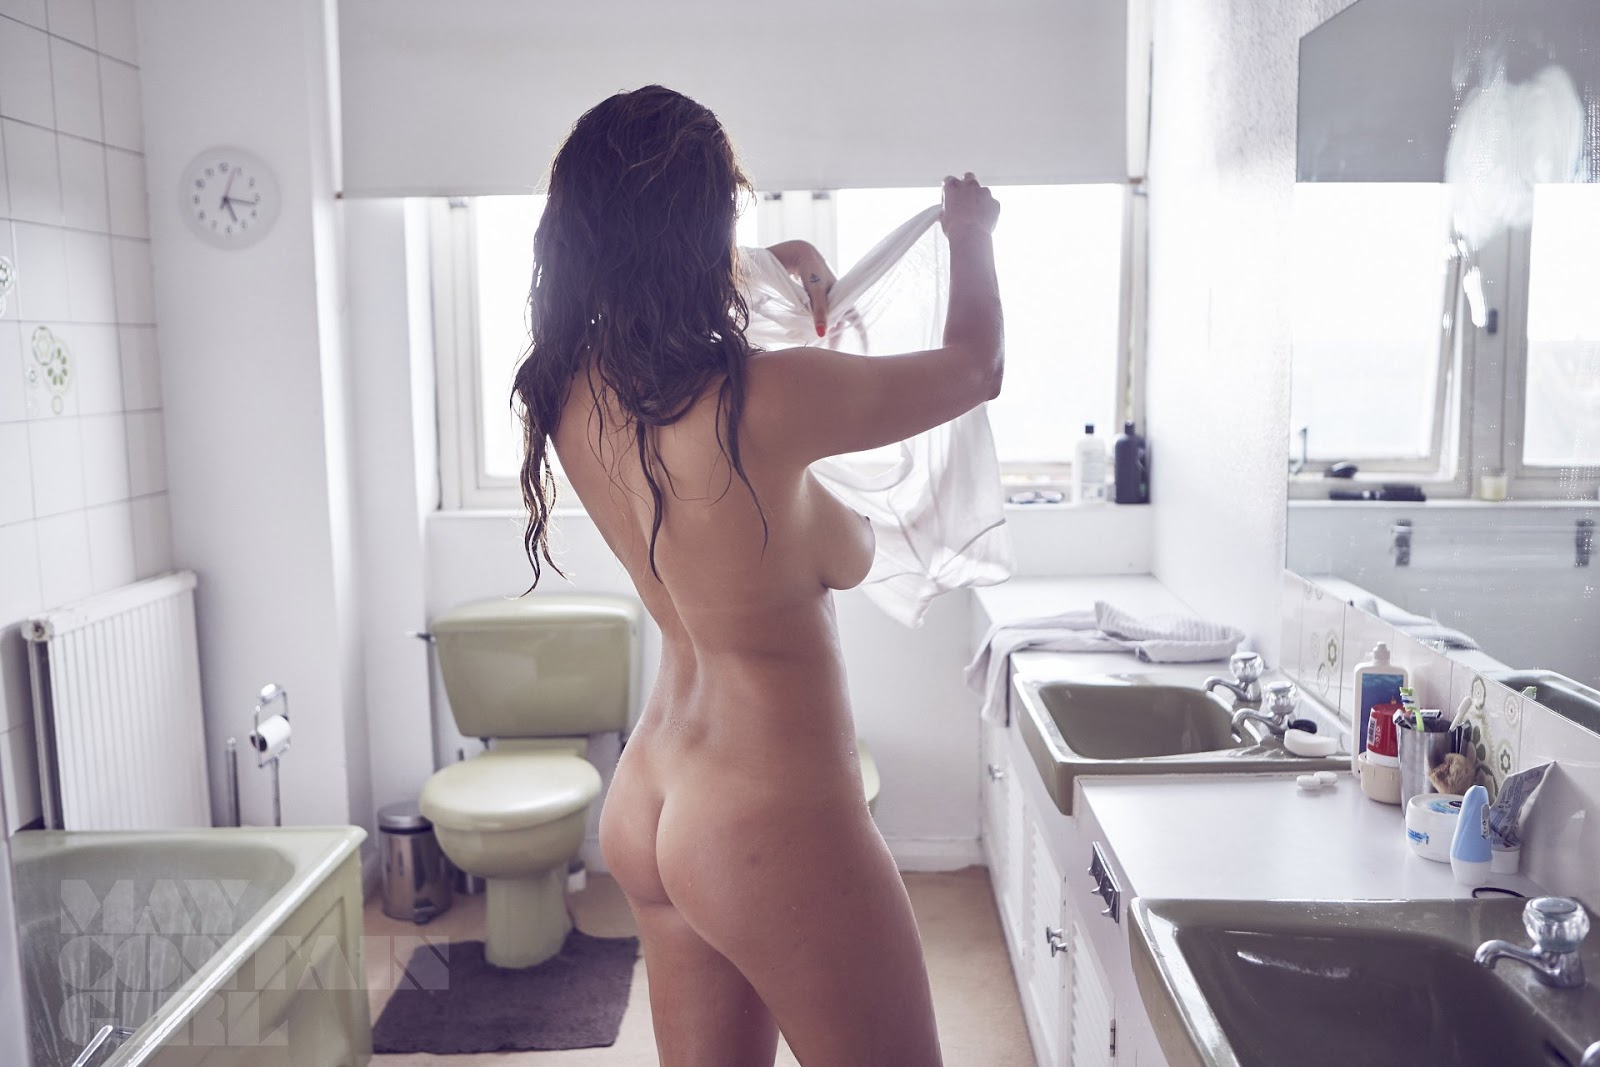 slut xxx sex hors ass bitch 69 pussy